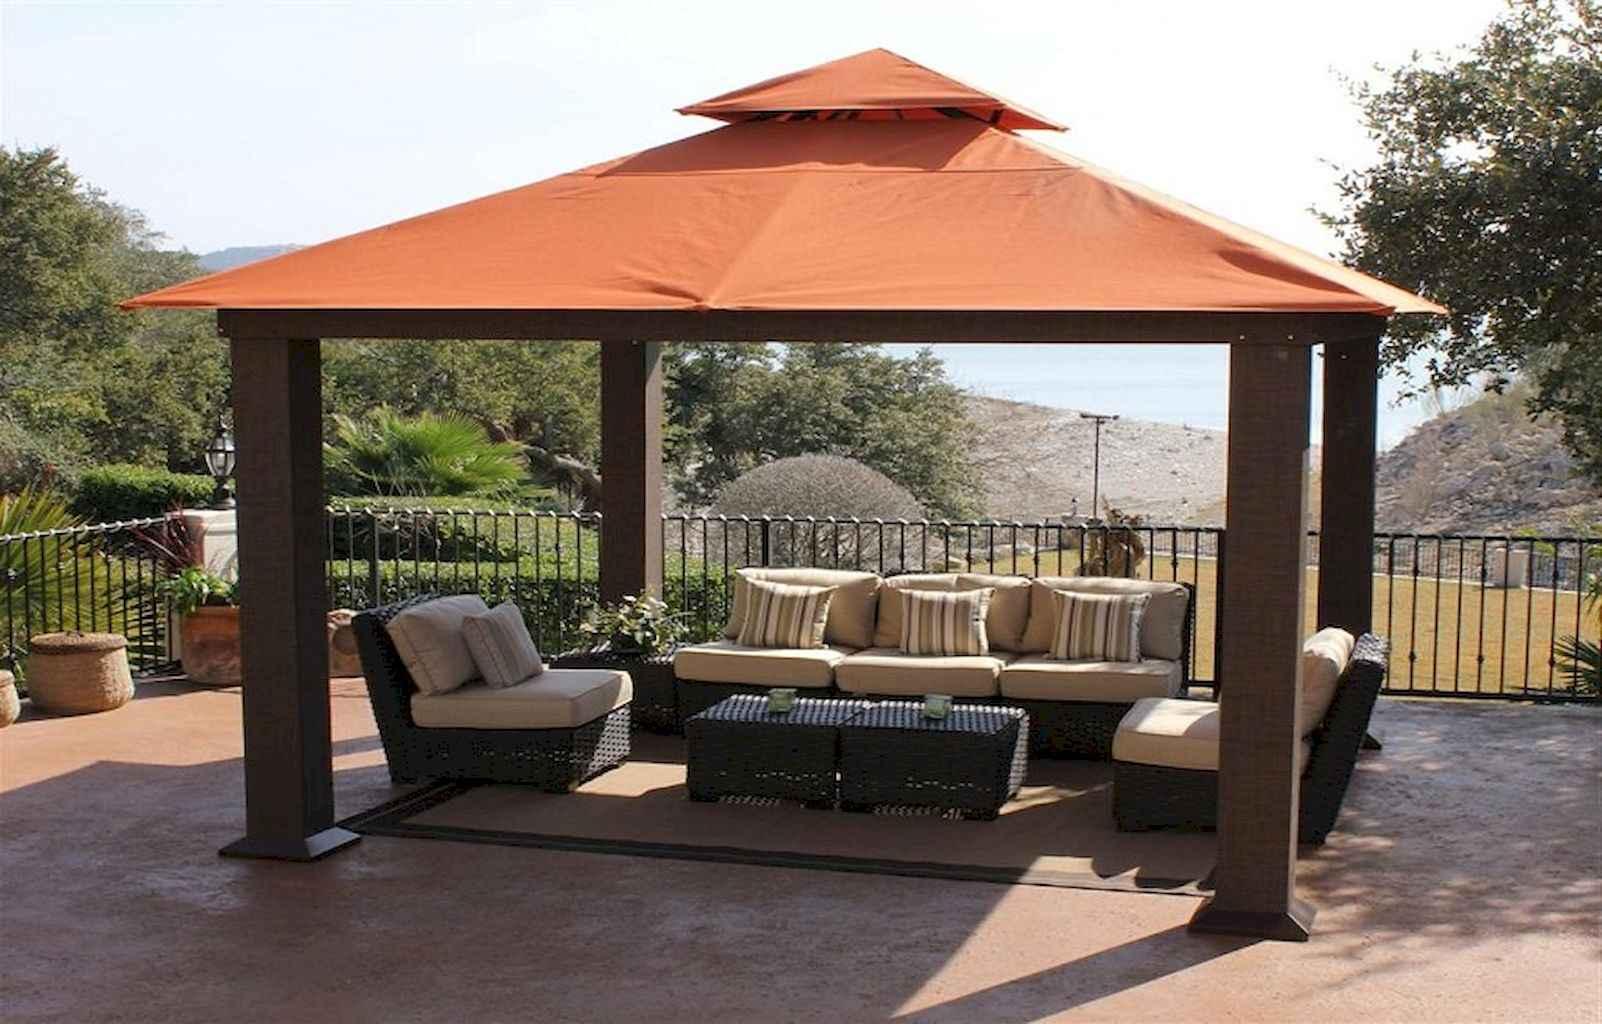 Top 25 Stunning Backyard Patio Design Ideas (22)